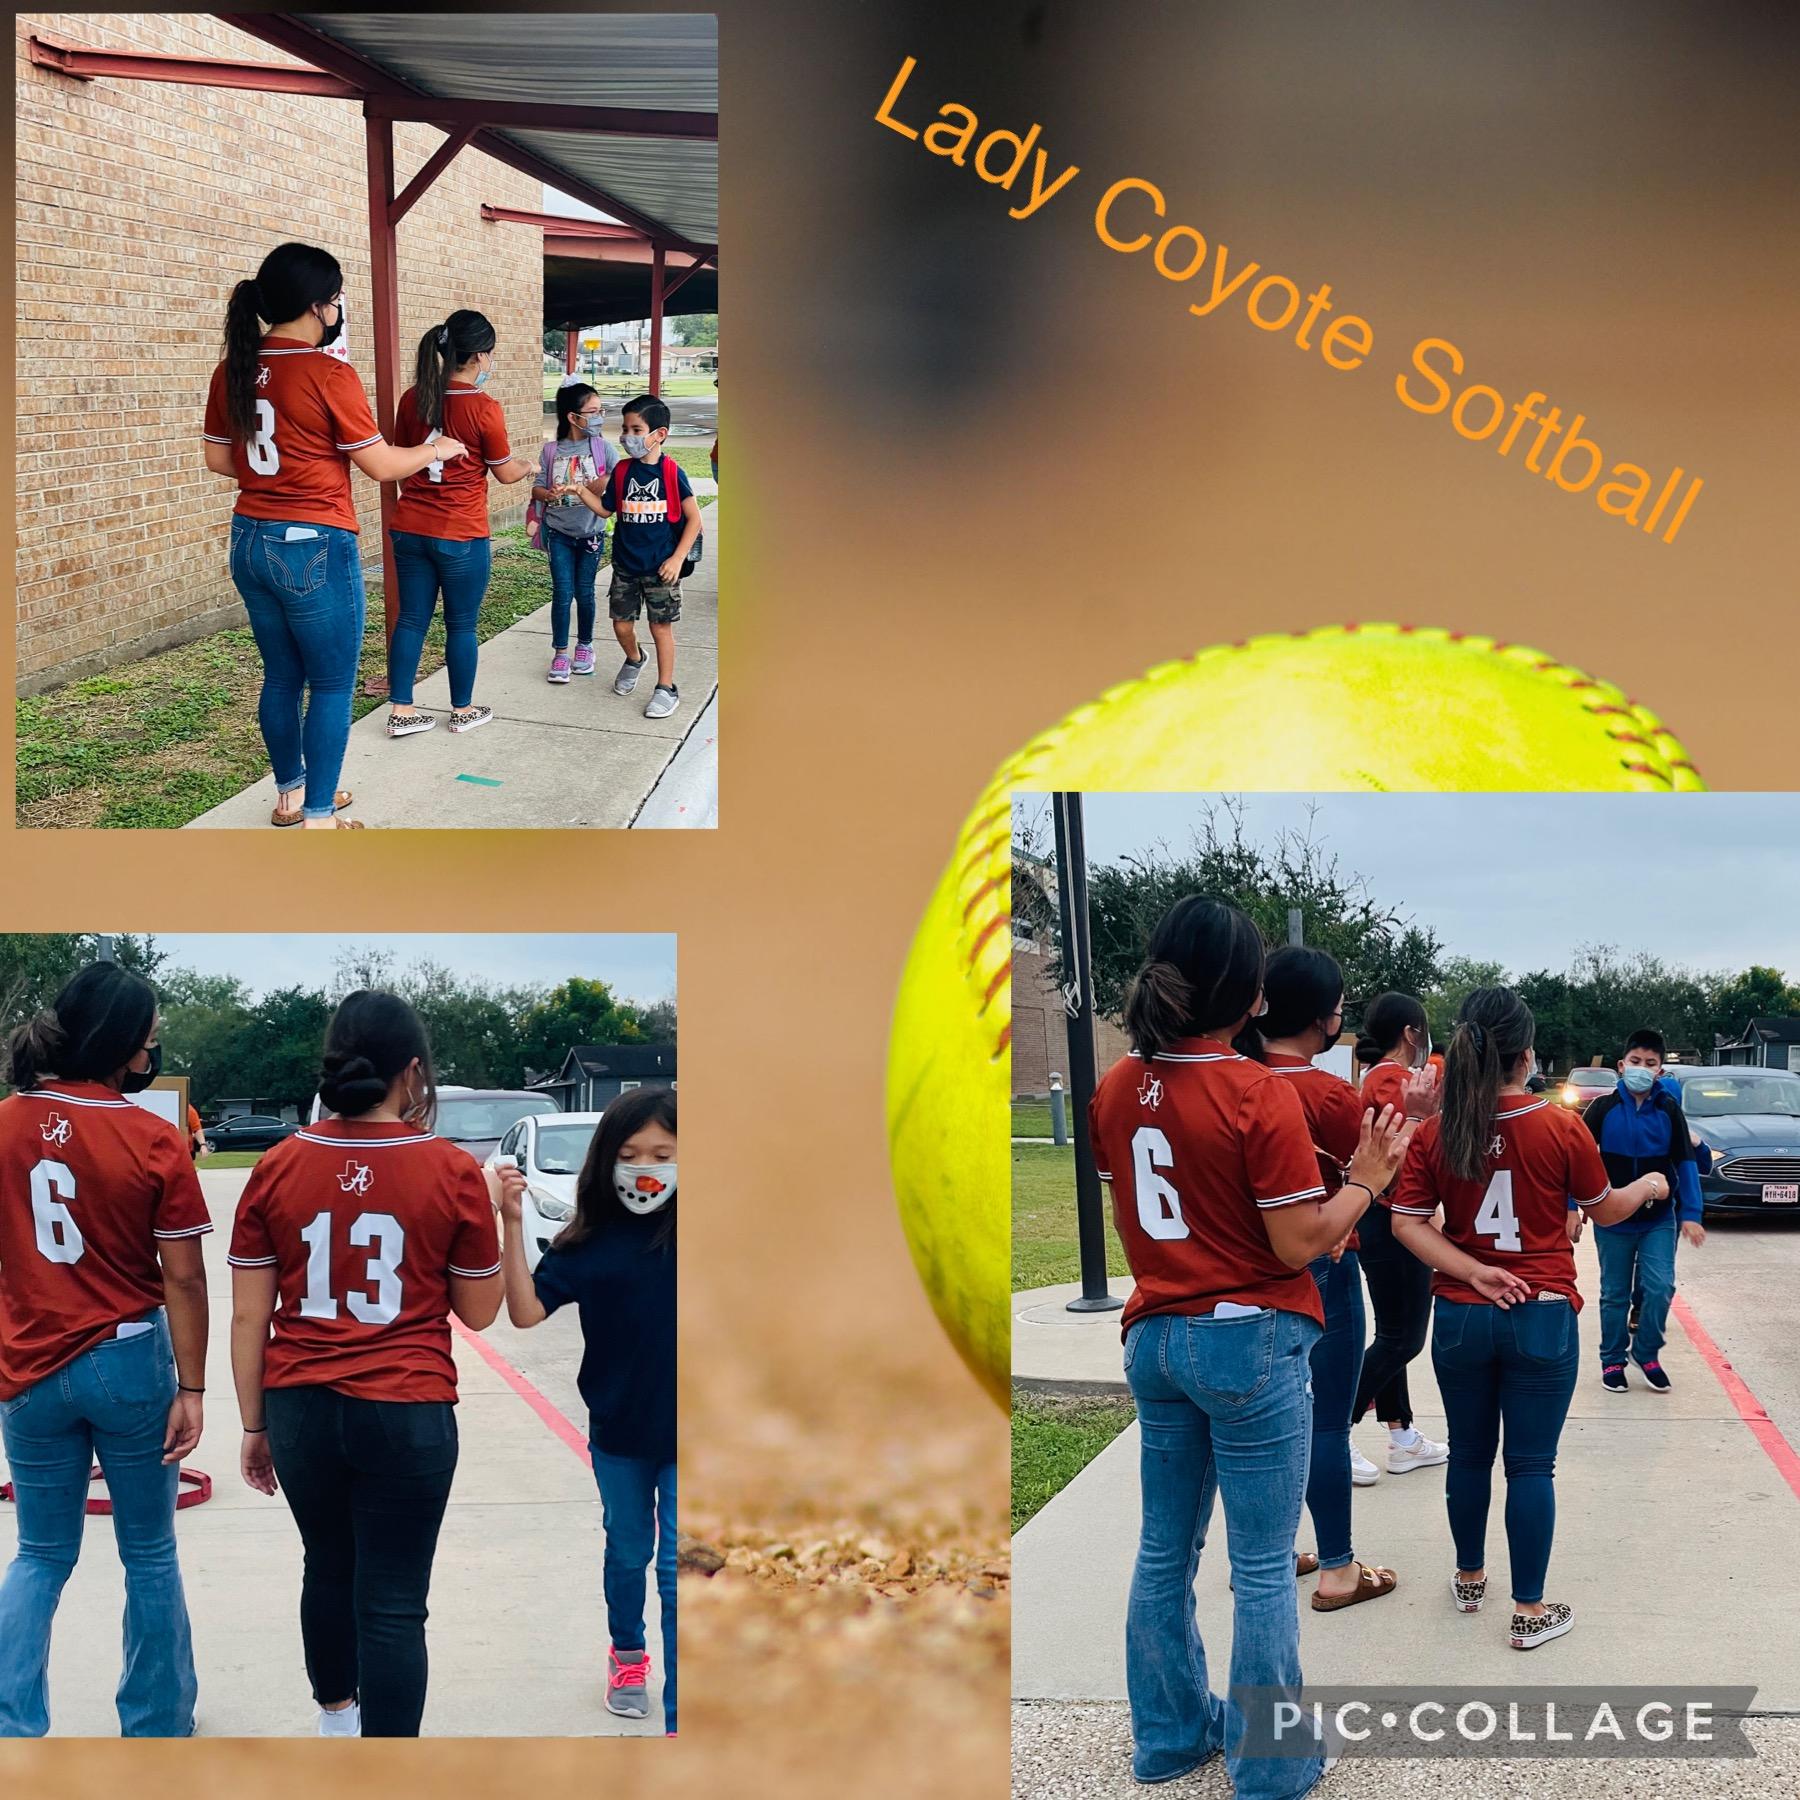 Lady Coyote Softball